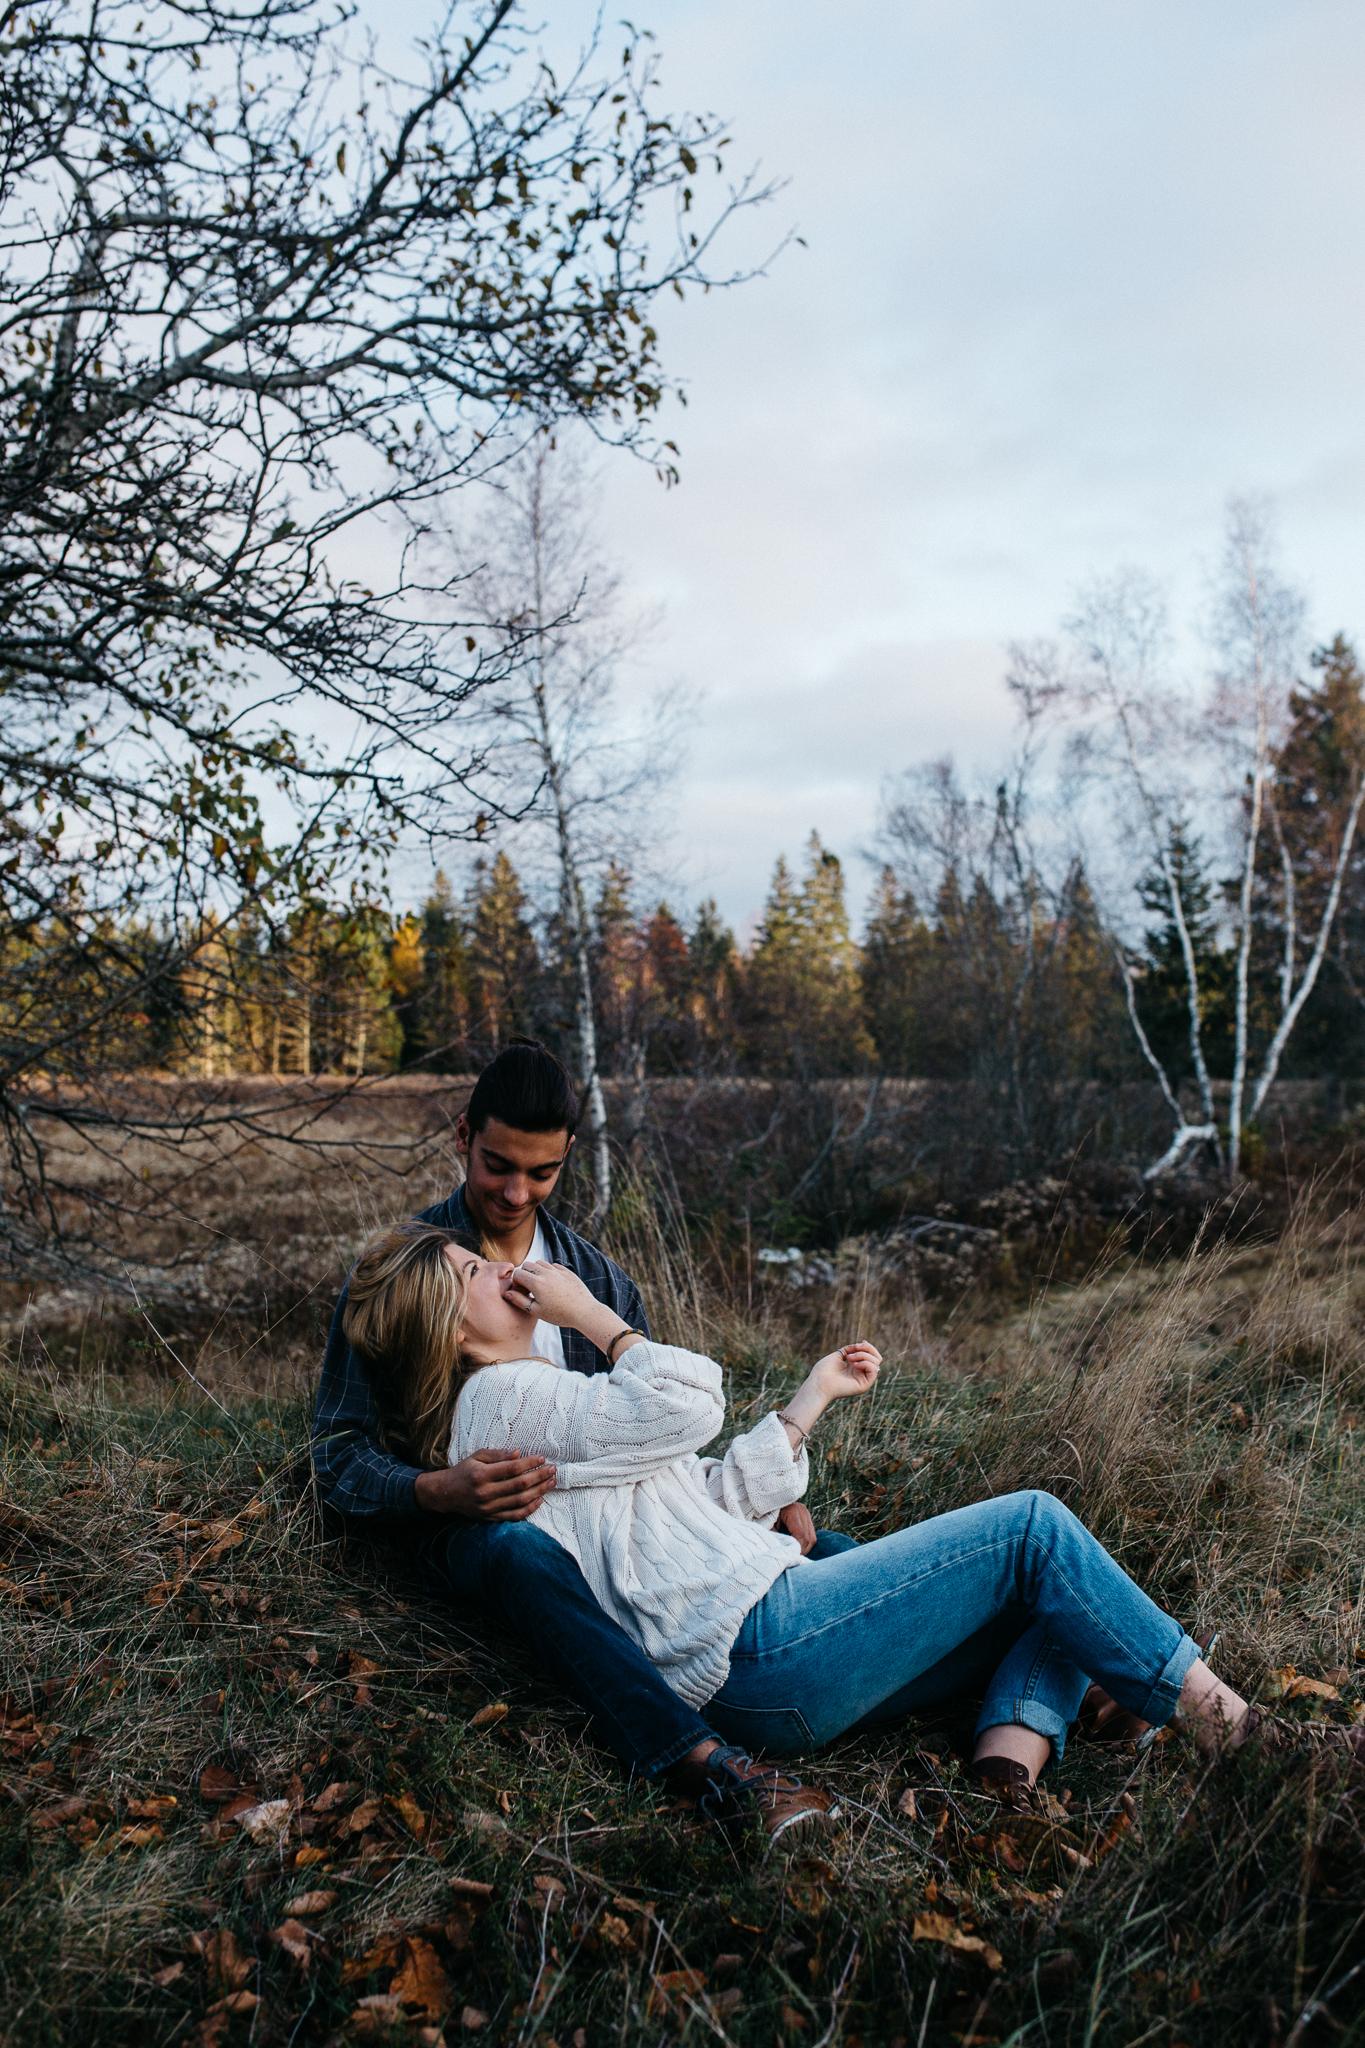 erinwheatcororyaylen-0789 Acadia National Park Lovers